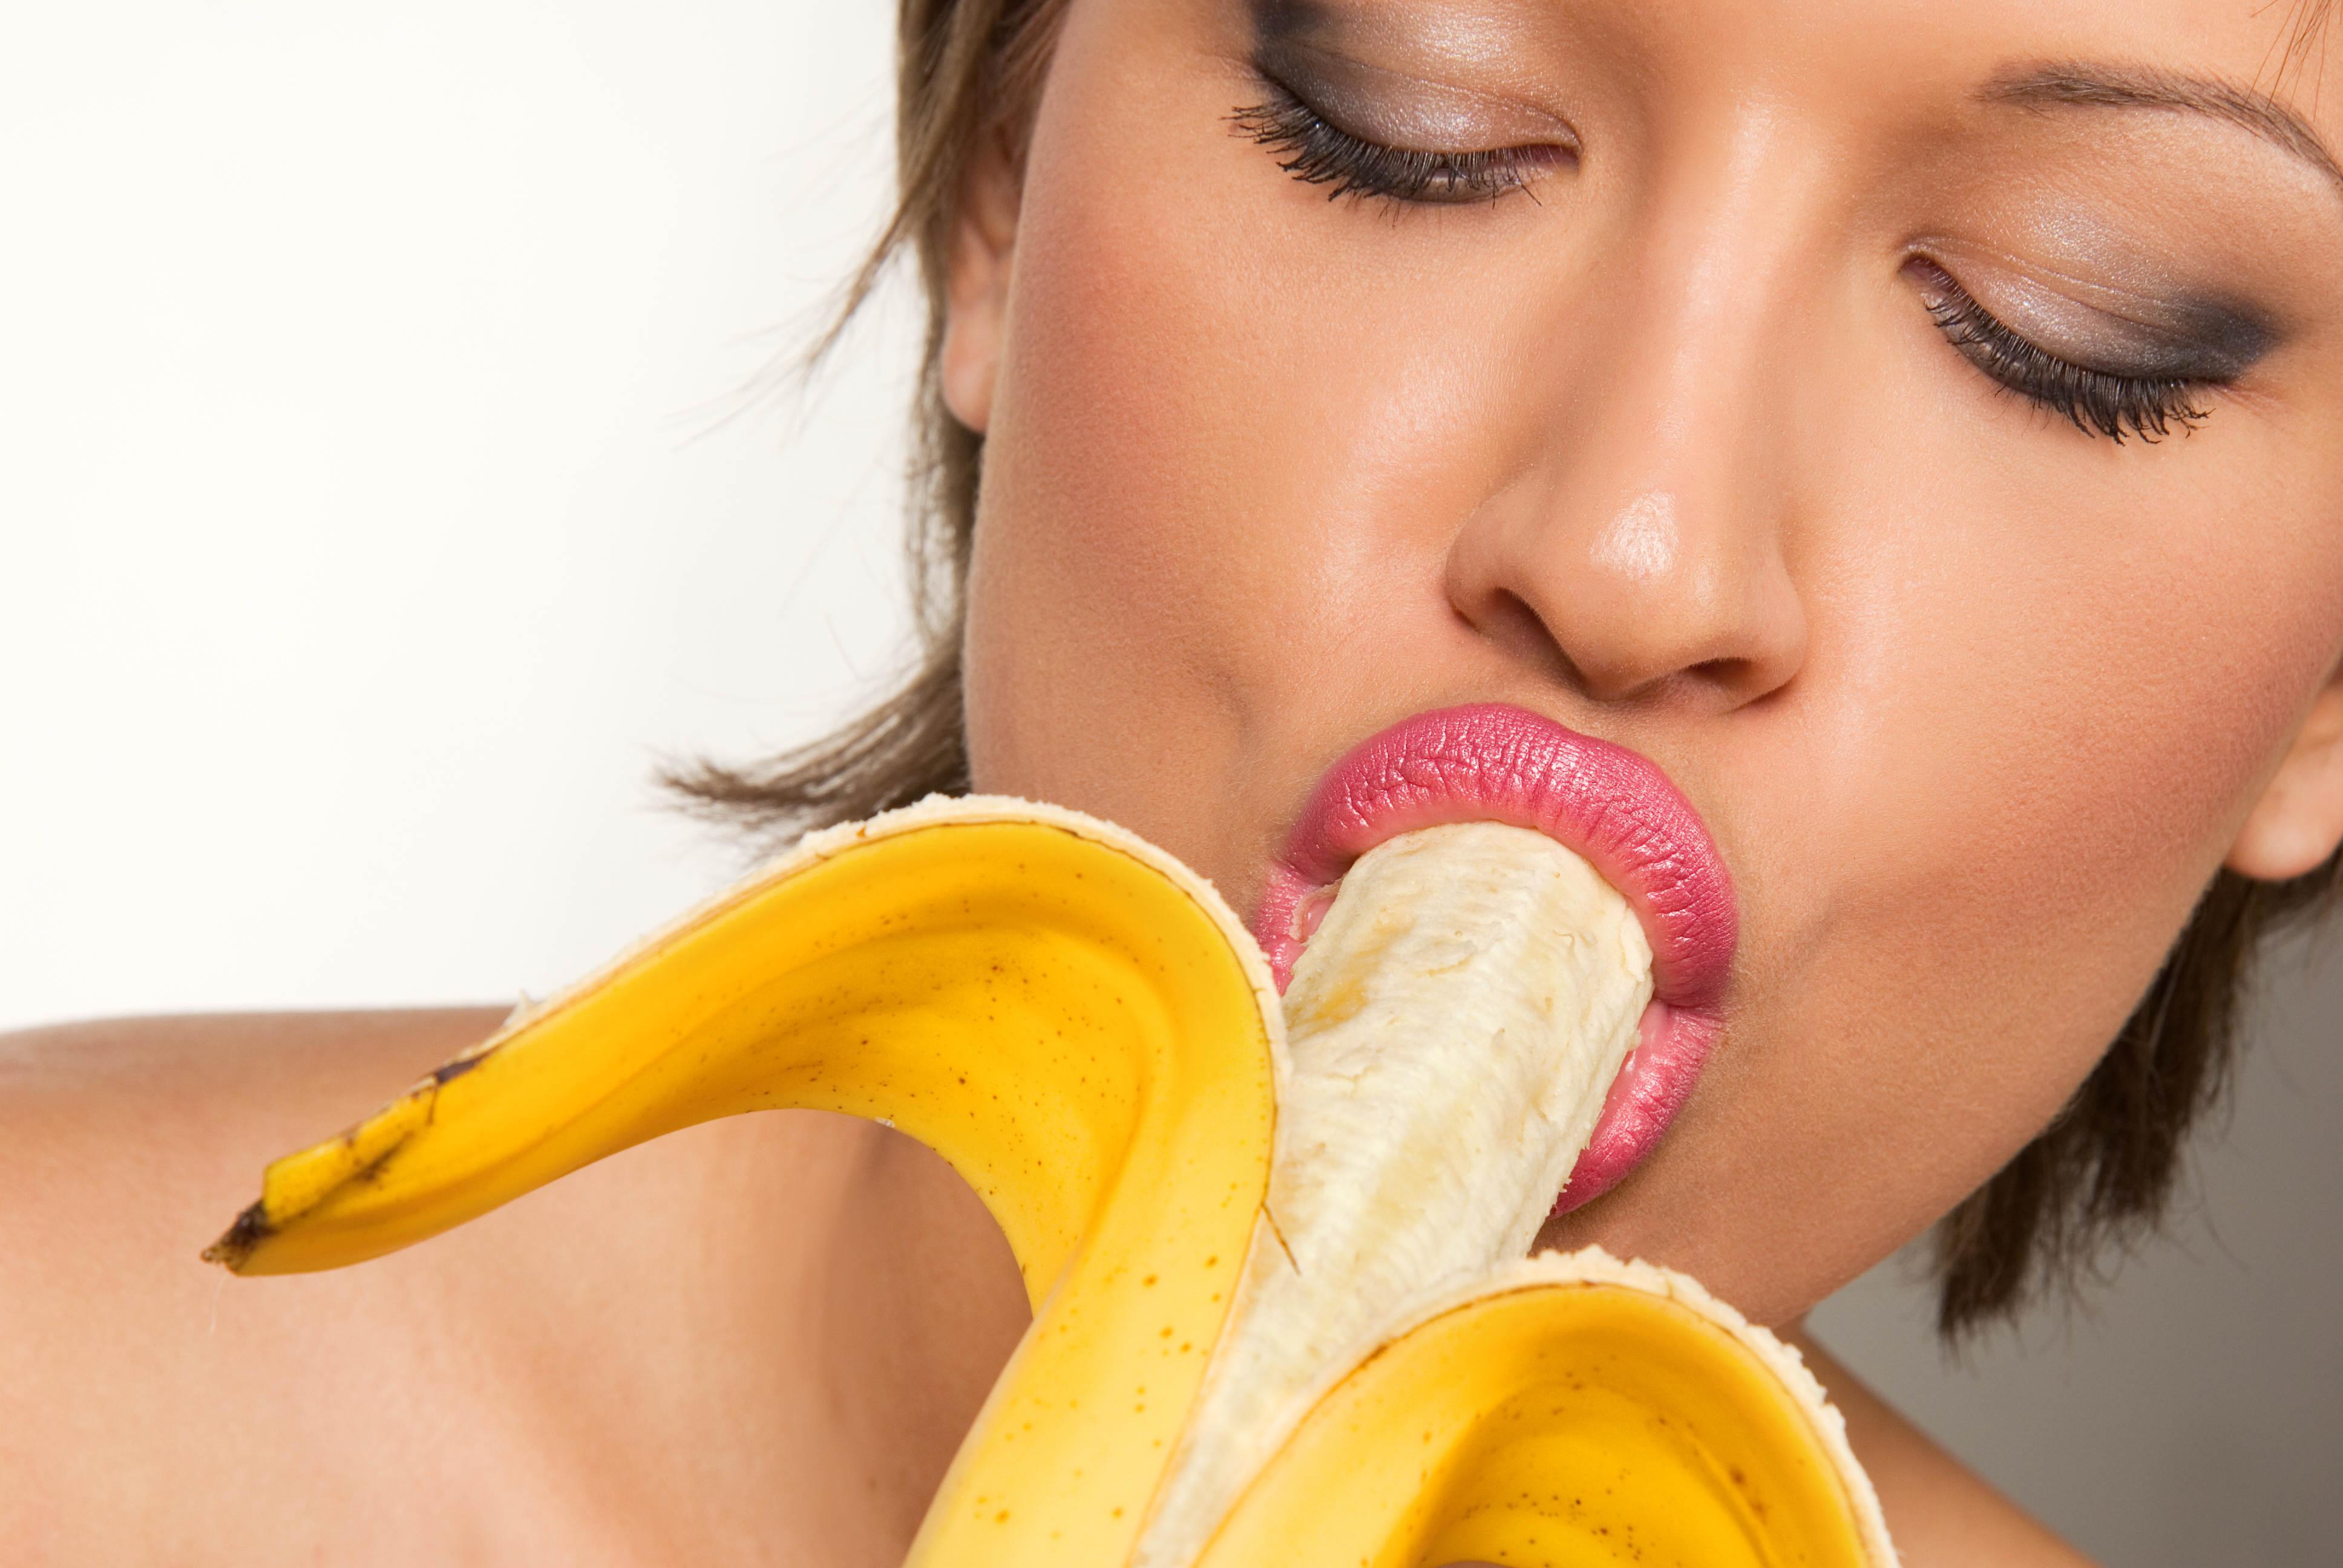 golie-devushka-lizhet-banan-drochat